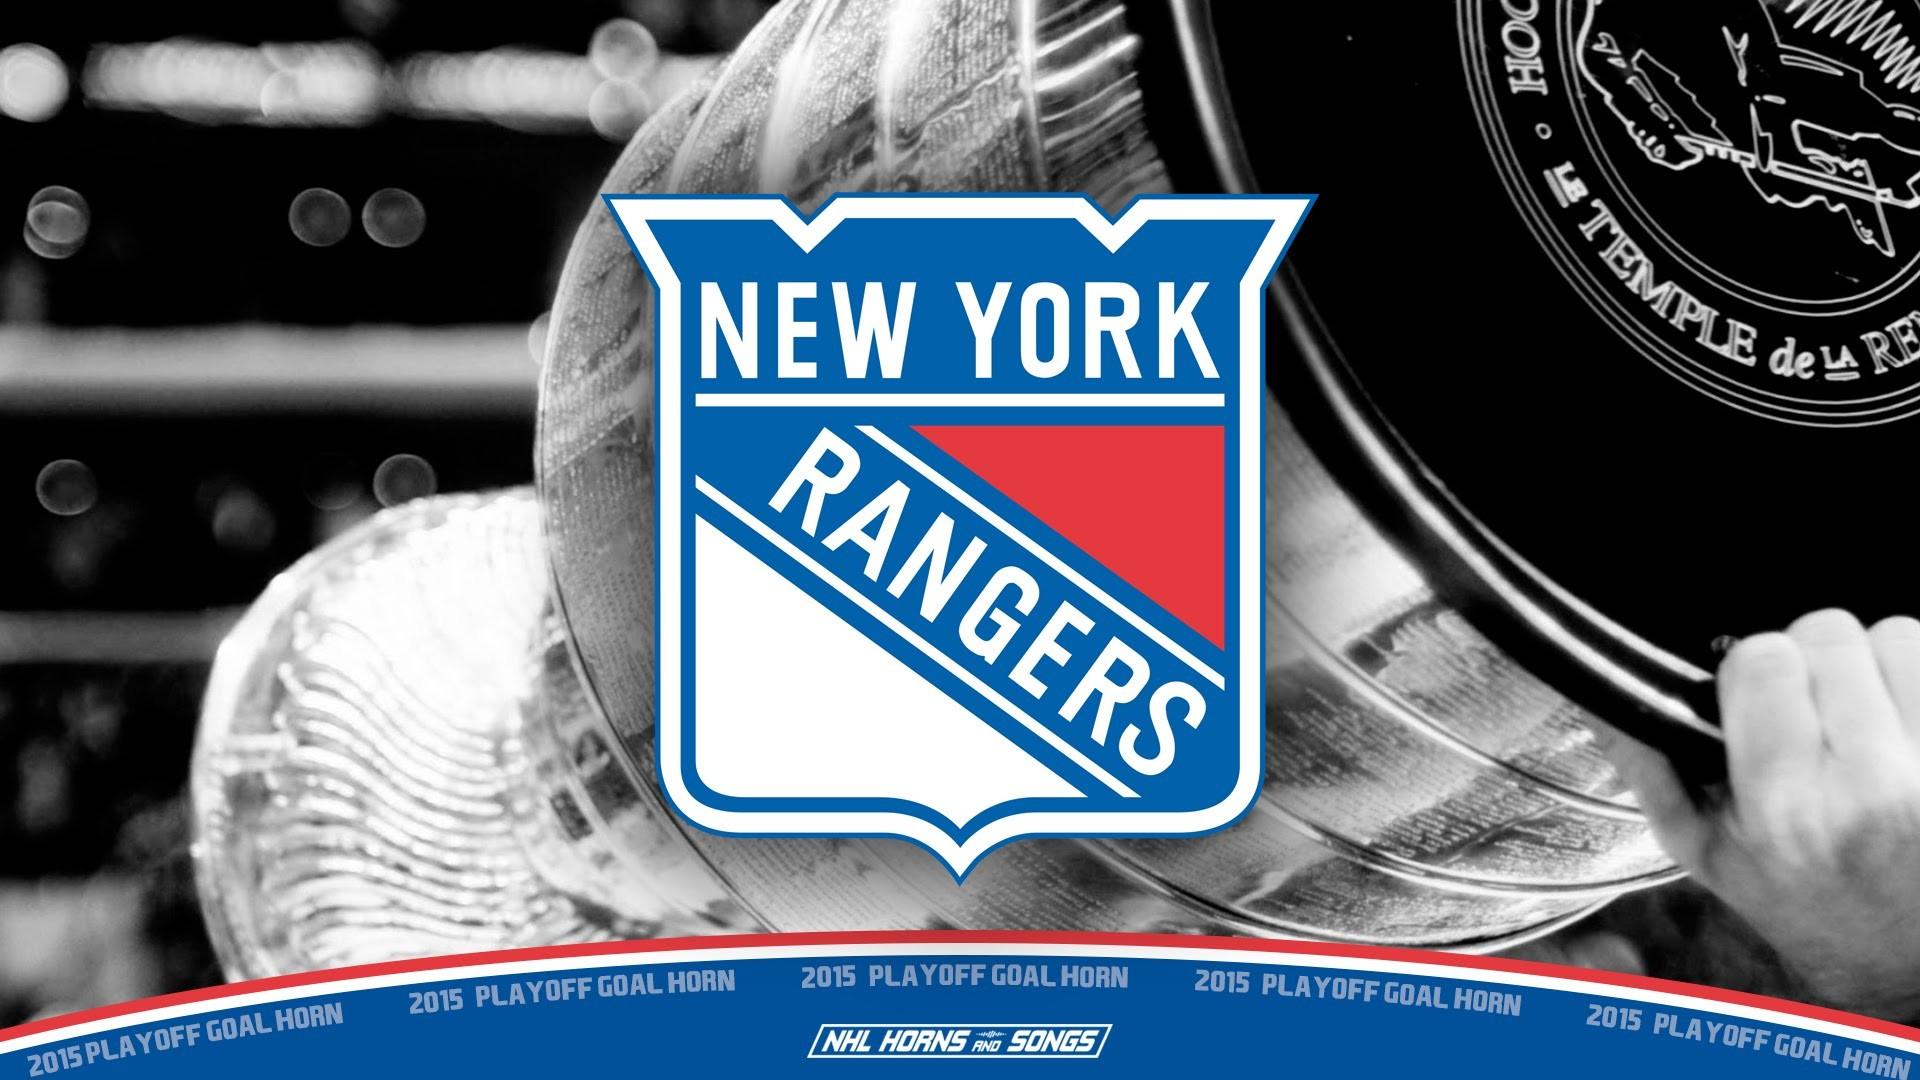 New York Rangers Iphone Wallpaper New York Rangers Wallpaper 74 Pictures